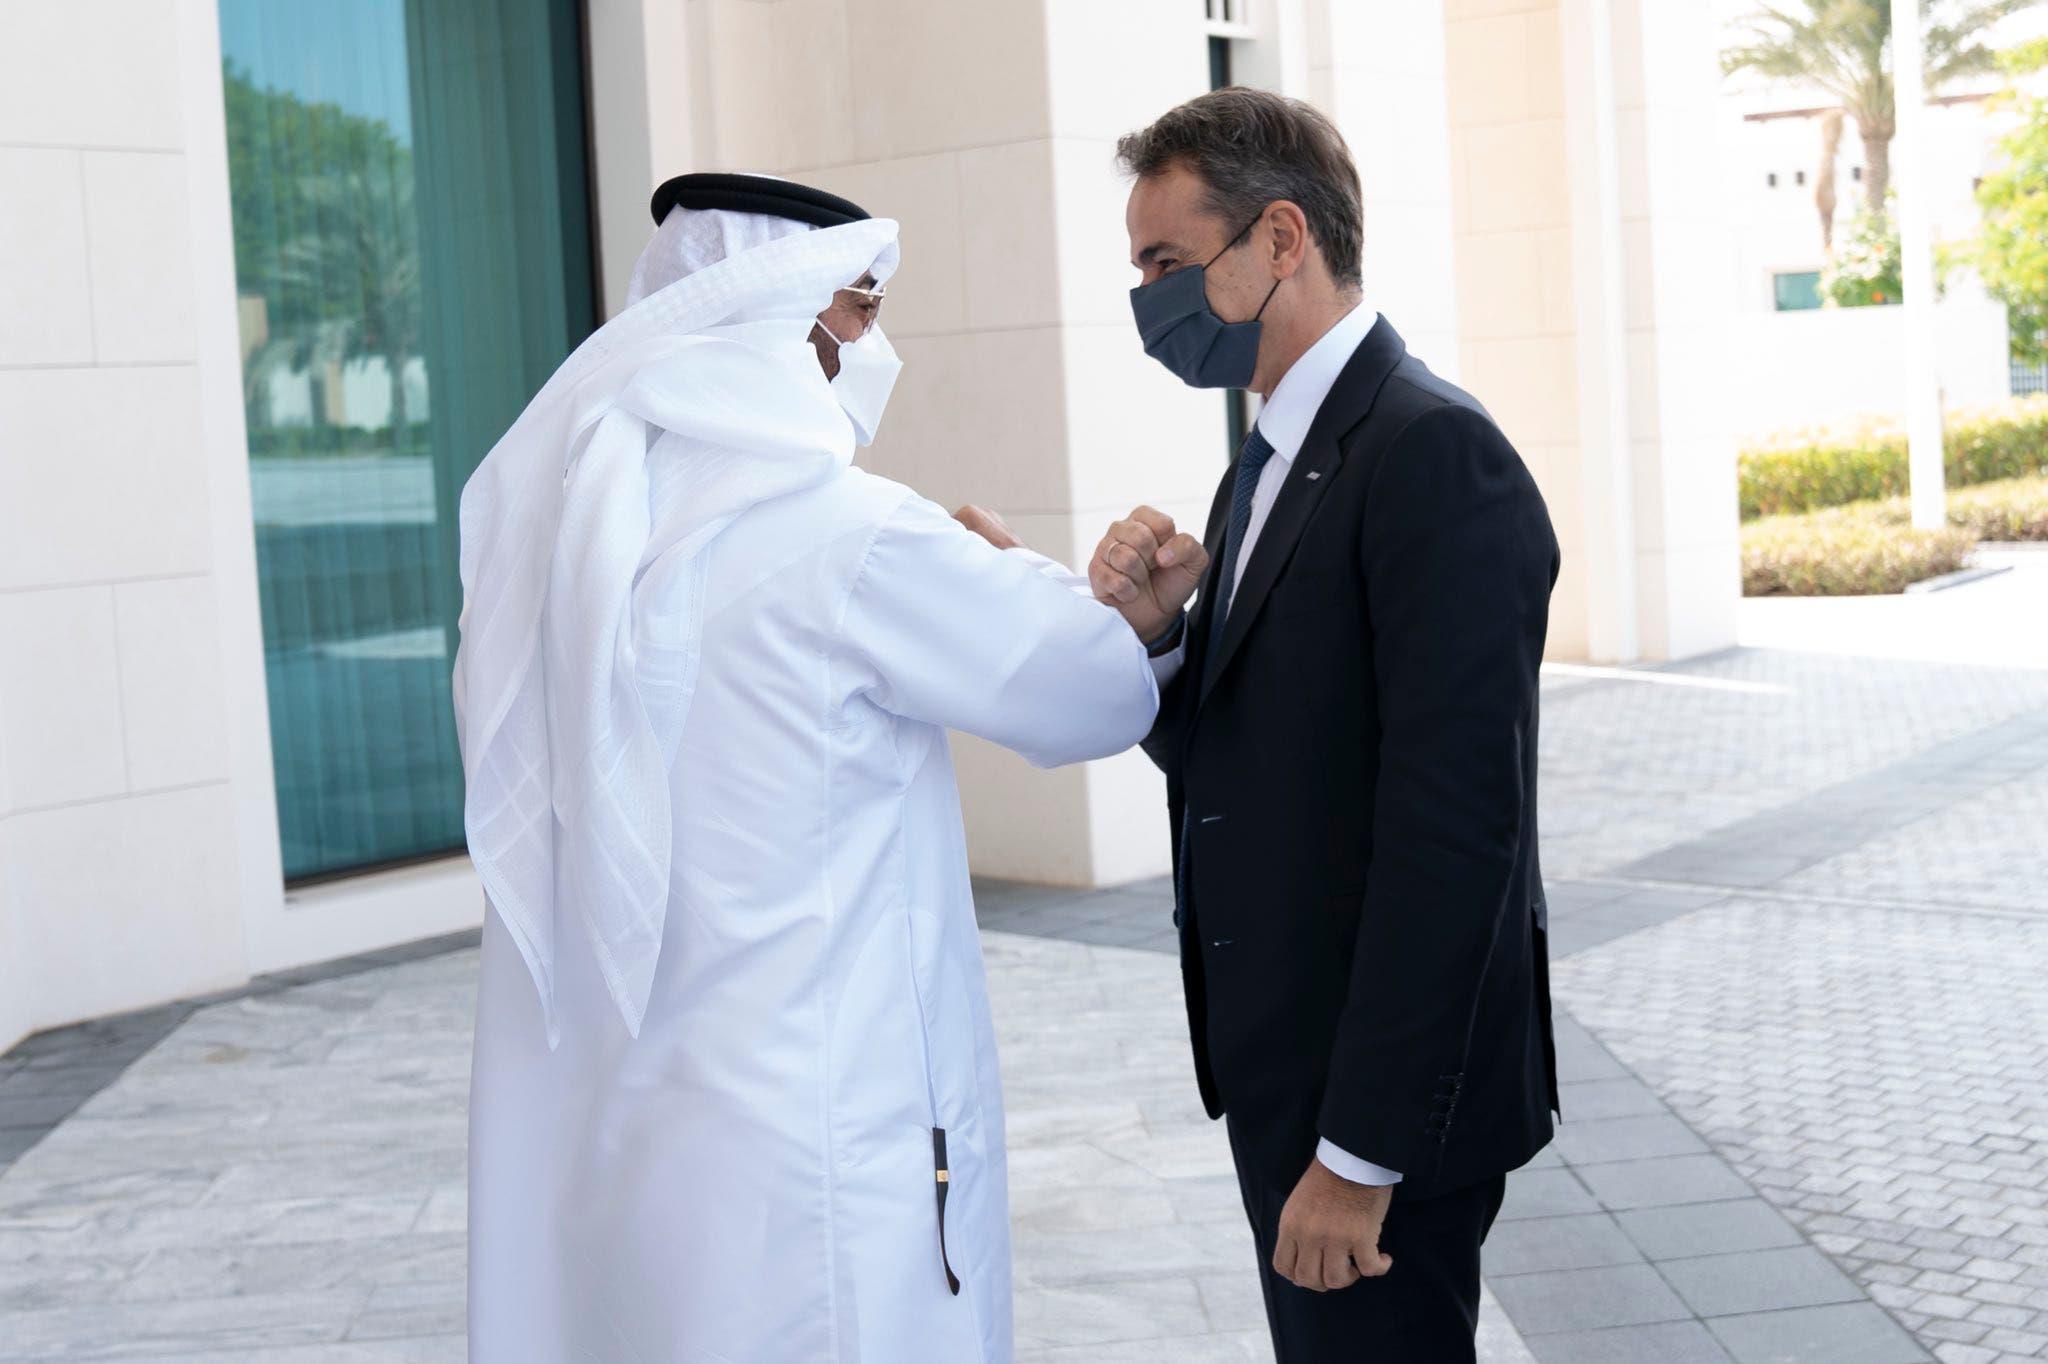 Abu Dhabi Crown Prince Sheikh Mohamed bin Zayed Al Nahyan, left, with Greek Prime Minister Kyriakos Mitsotakis. (Twitter)